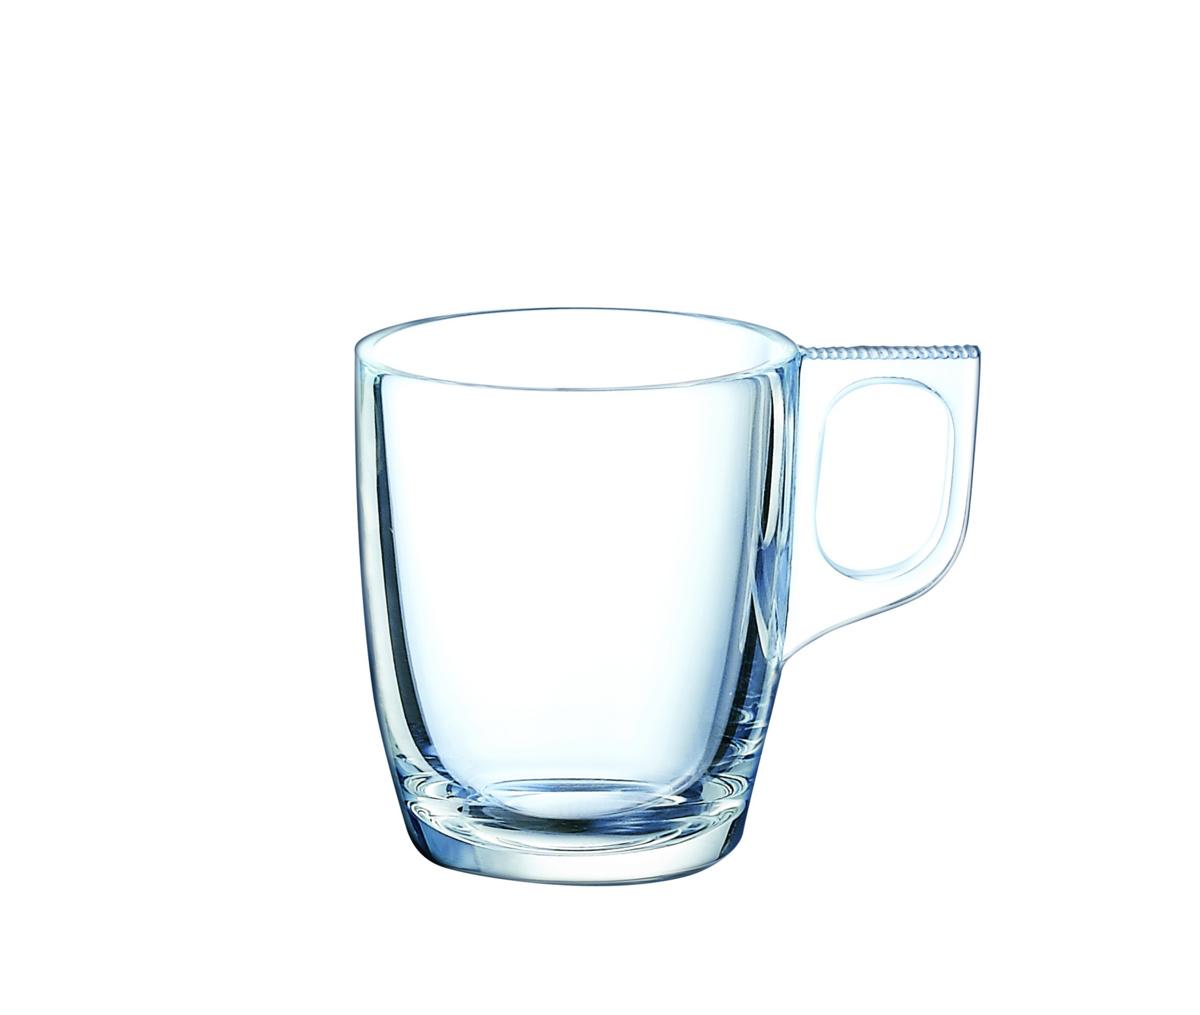 Tasse à expresso ronde transparente verre 9 cl Ø 8,40 cm Voluto Arcoroc